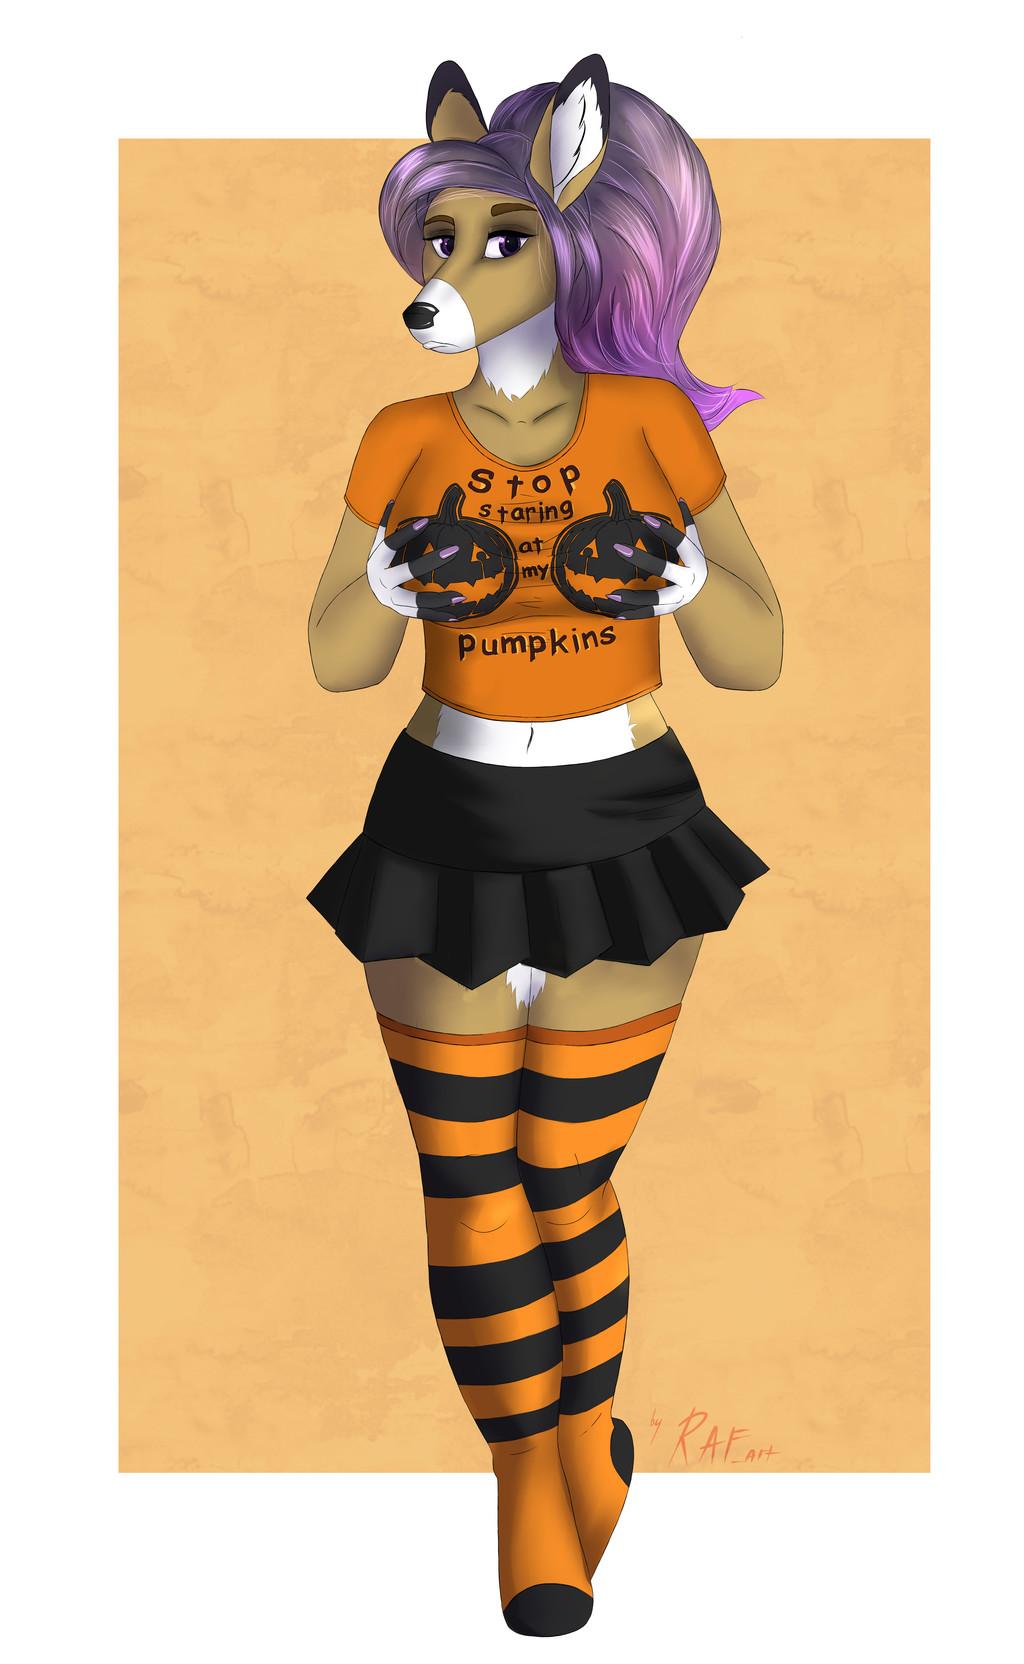 Pumpkin Problems by RAF_art